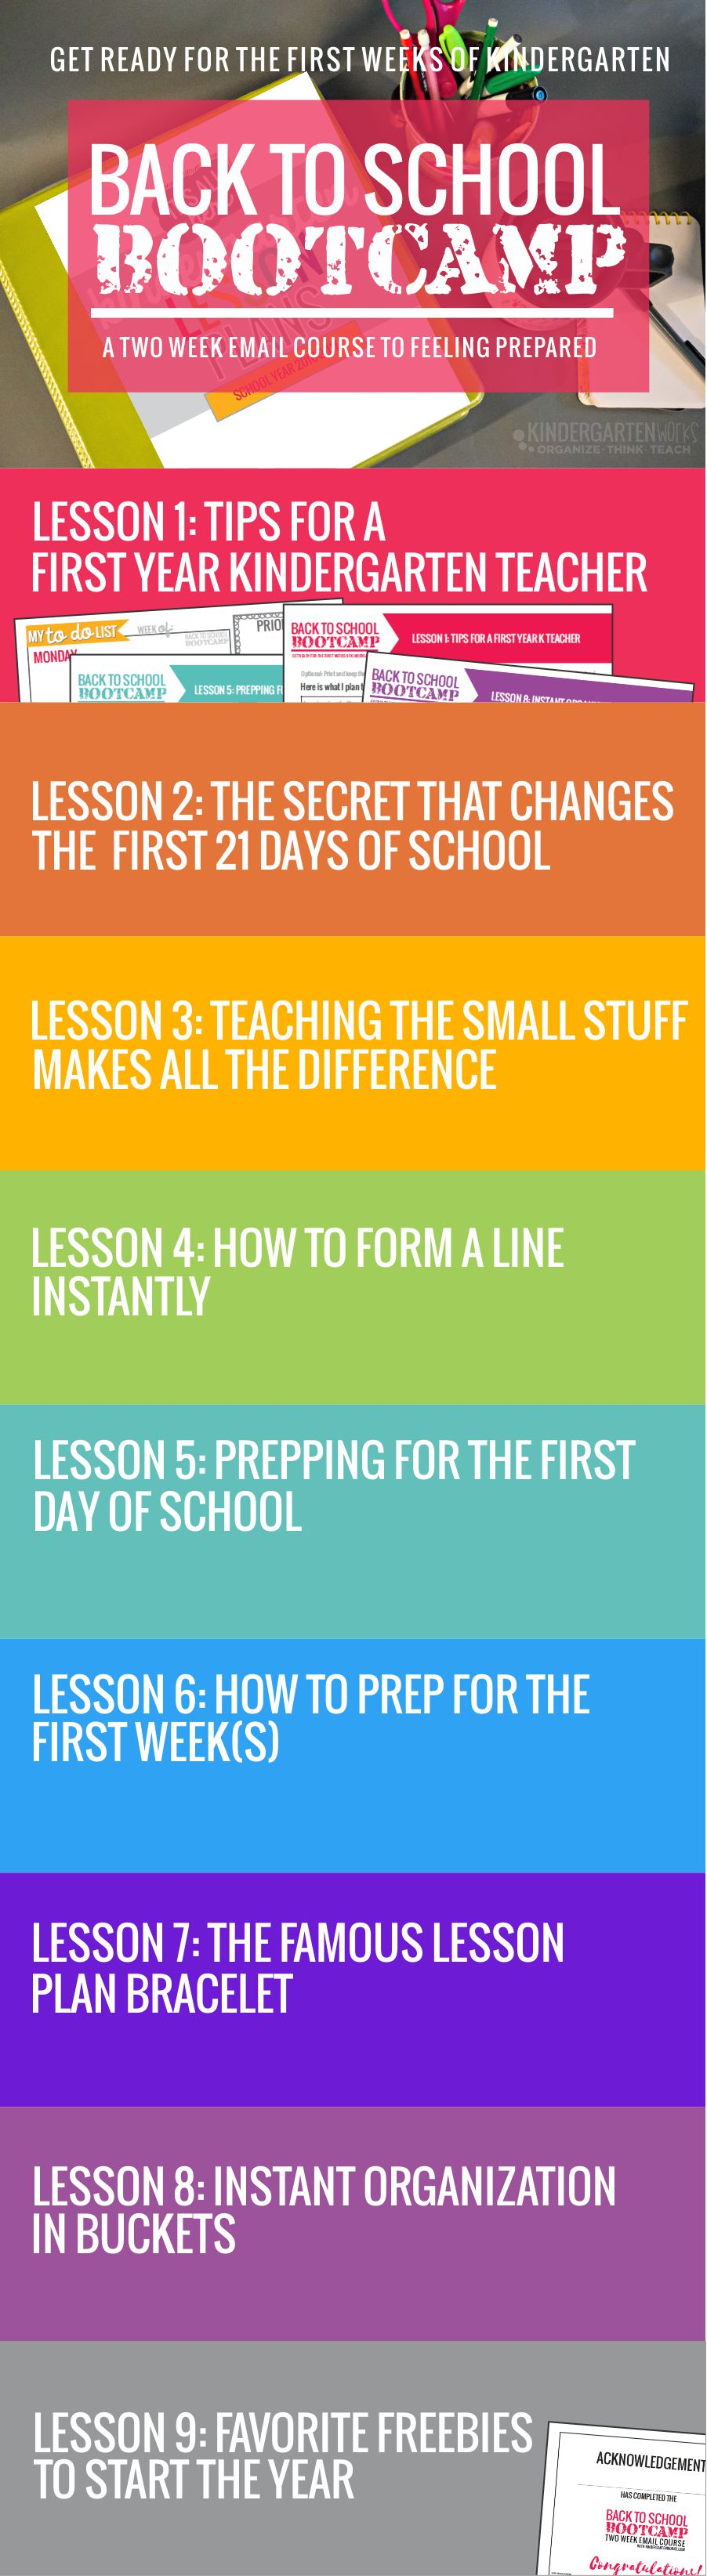 Free back to school bootcamp for kindergarten teachers - start teaching kindergarten